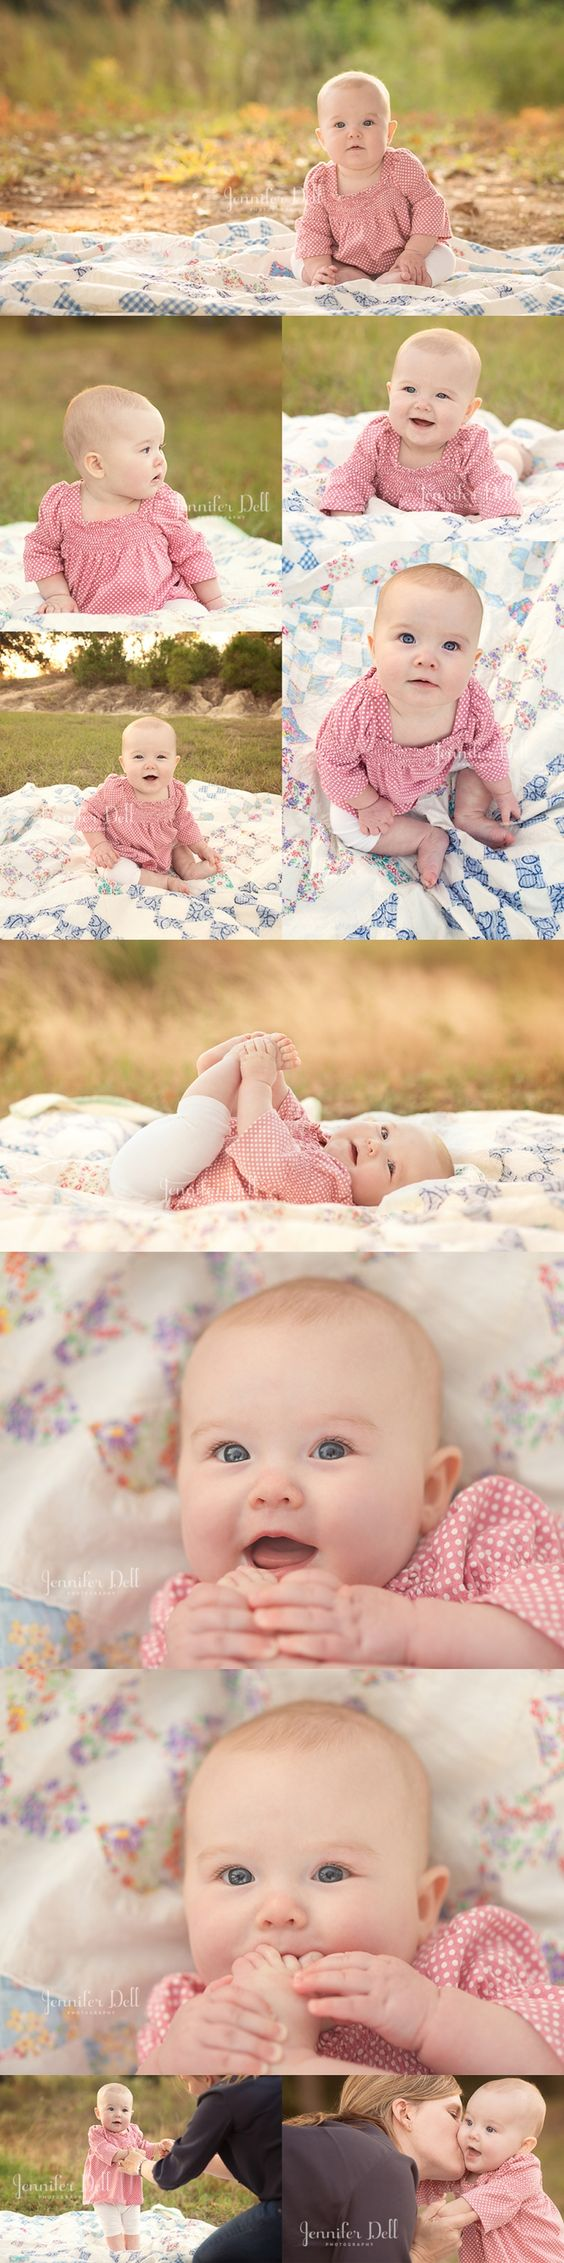 © Jennifer Dell Photography  www.jenniferdellphotography.com  houston-baby-photographer